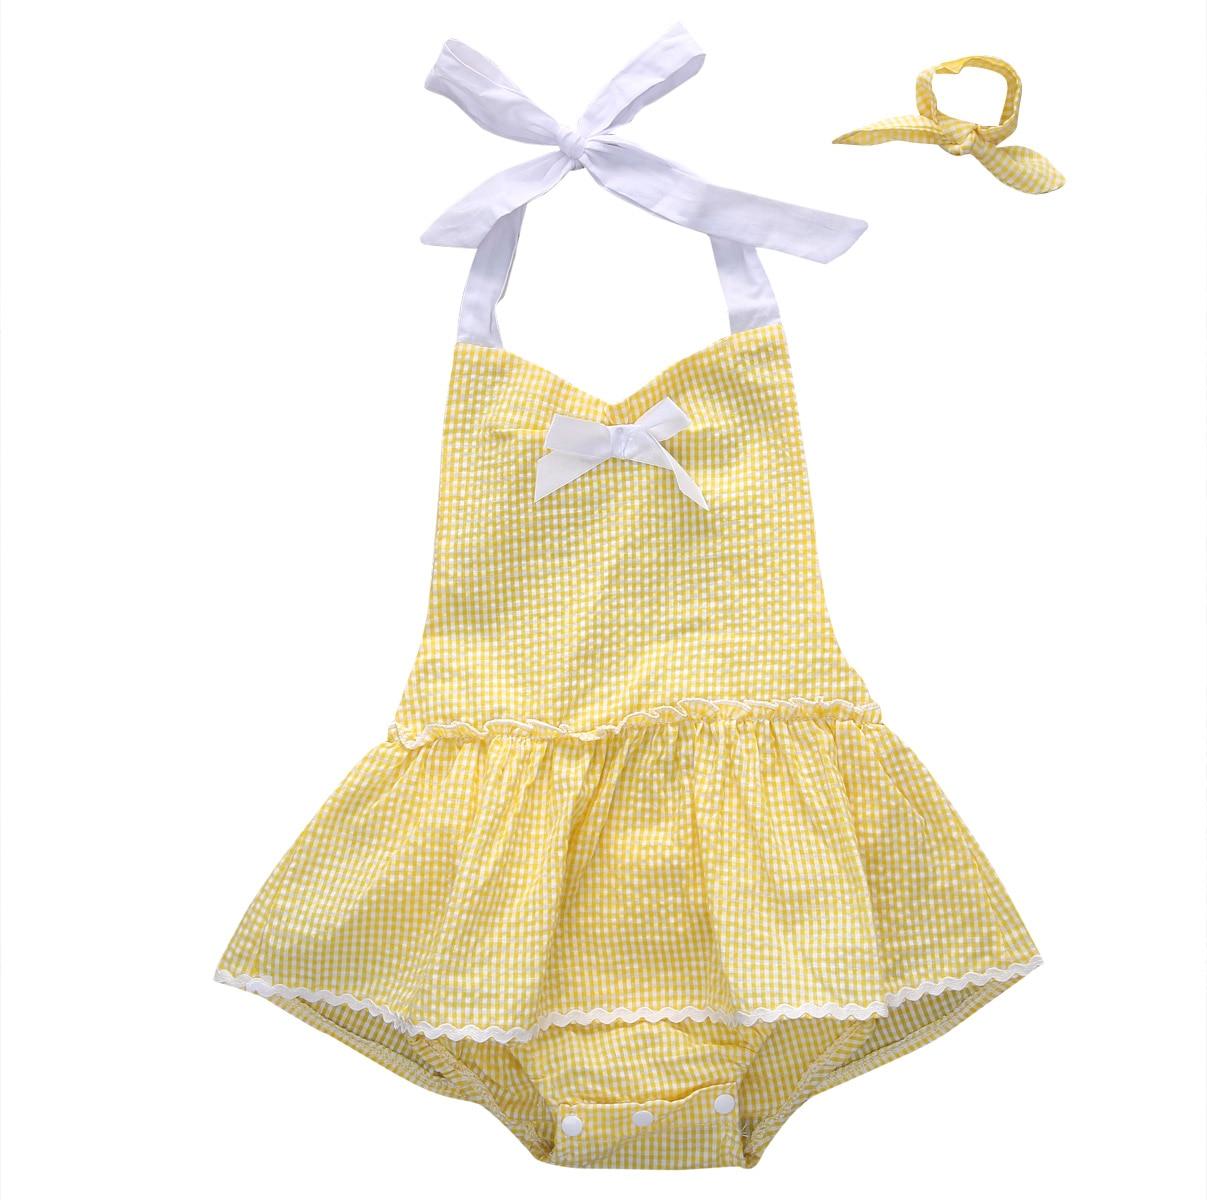 Cute Newborn Baby Girls Kids clothes Sleeveless Romper+Headband Outfit Kids Baby Girls Cotton Summer Sunsuit